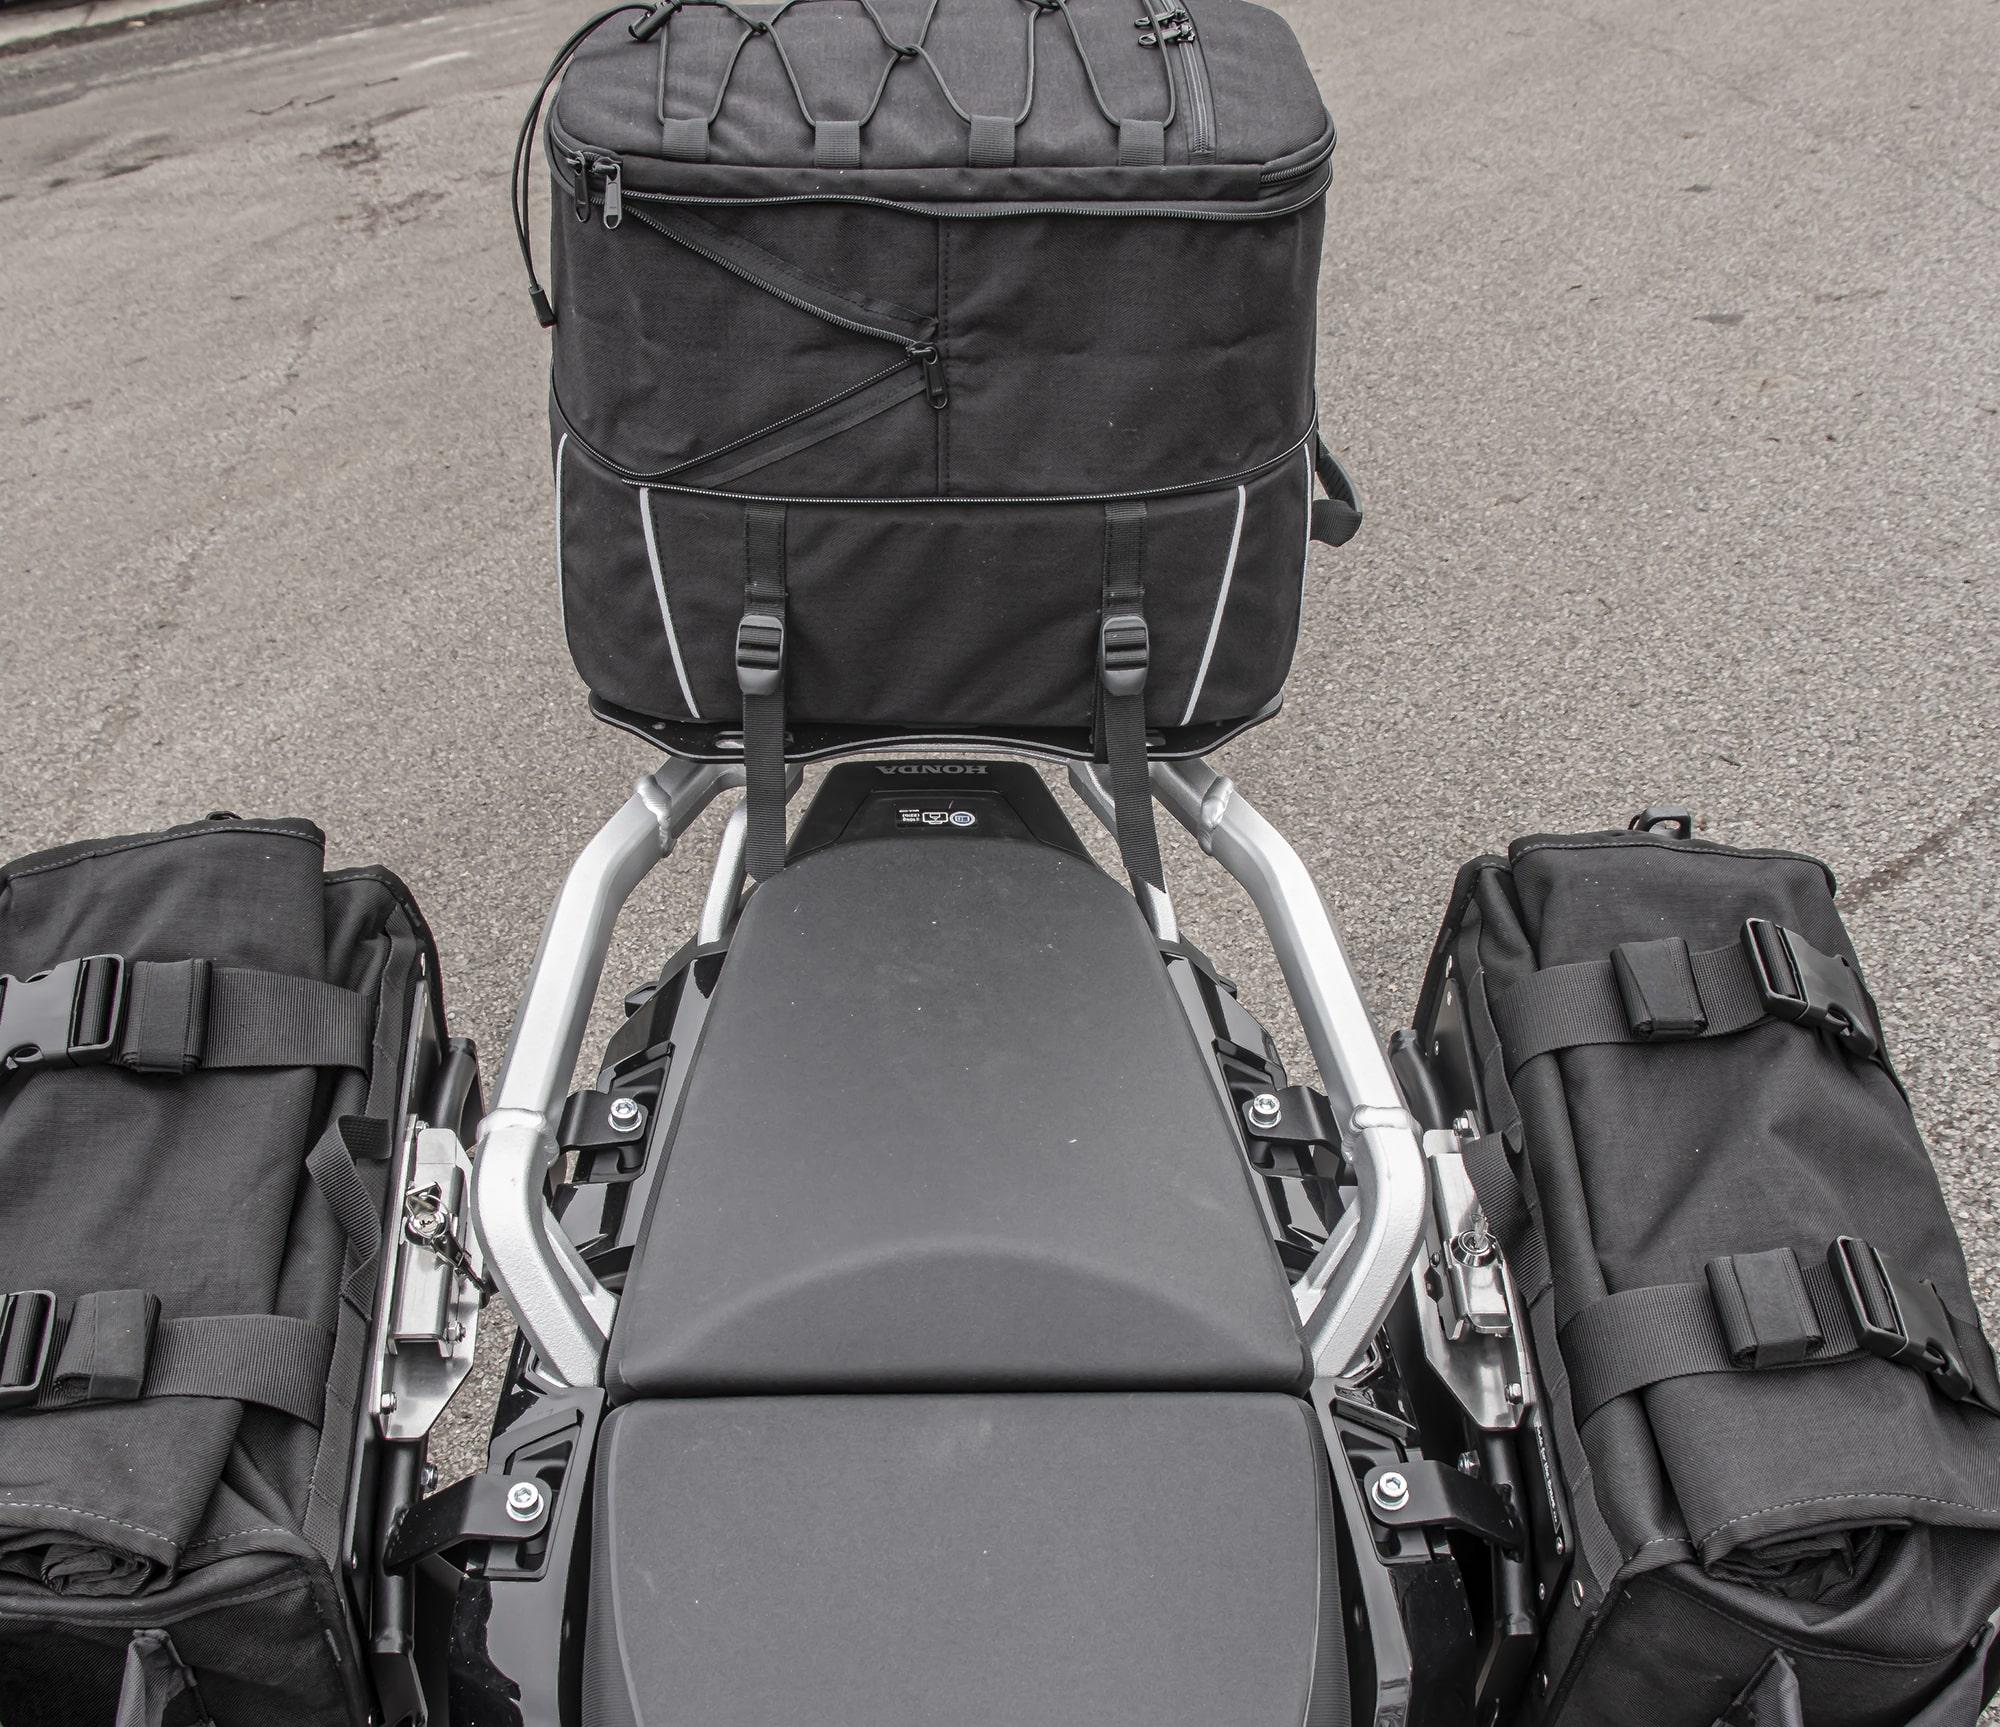 Xtremada Tail bag